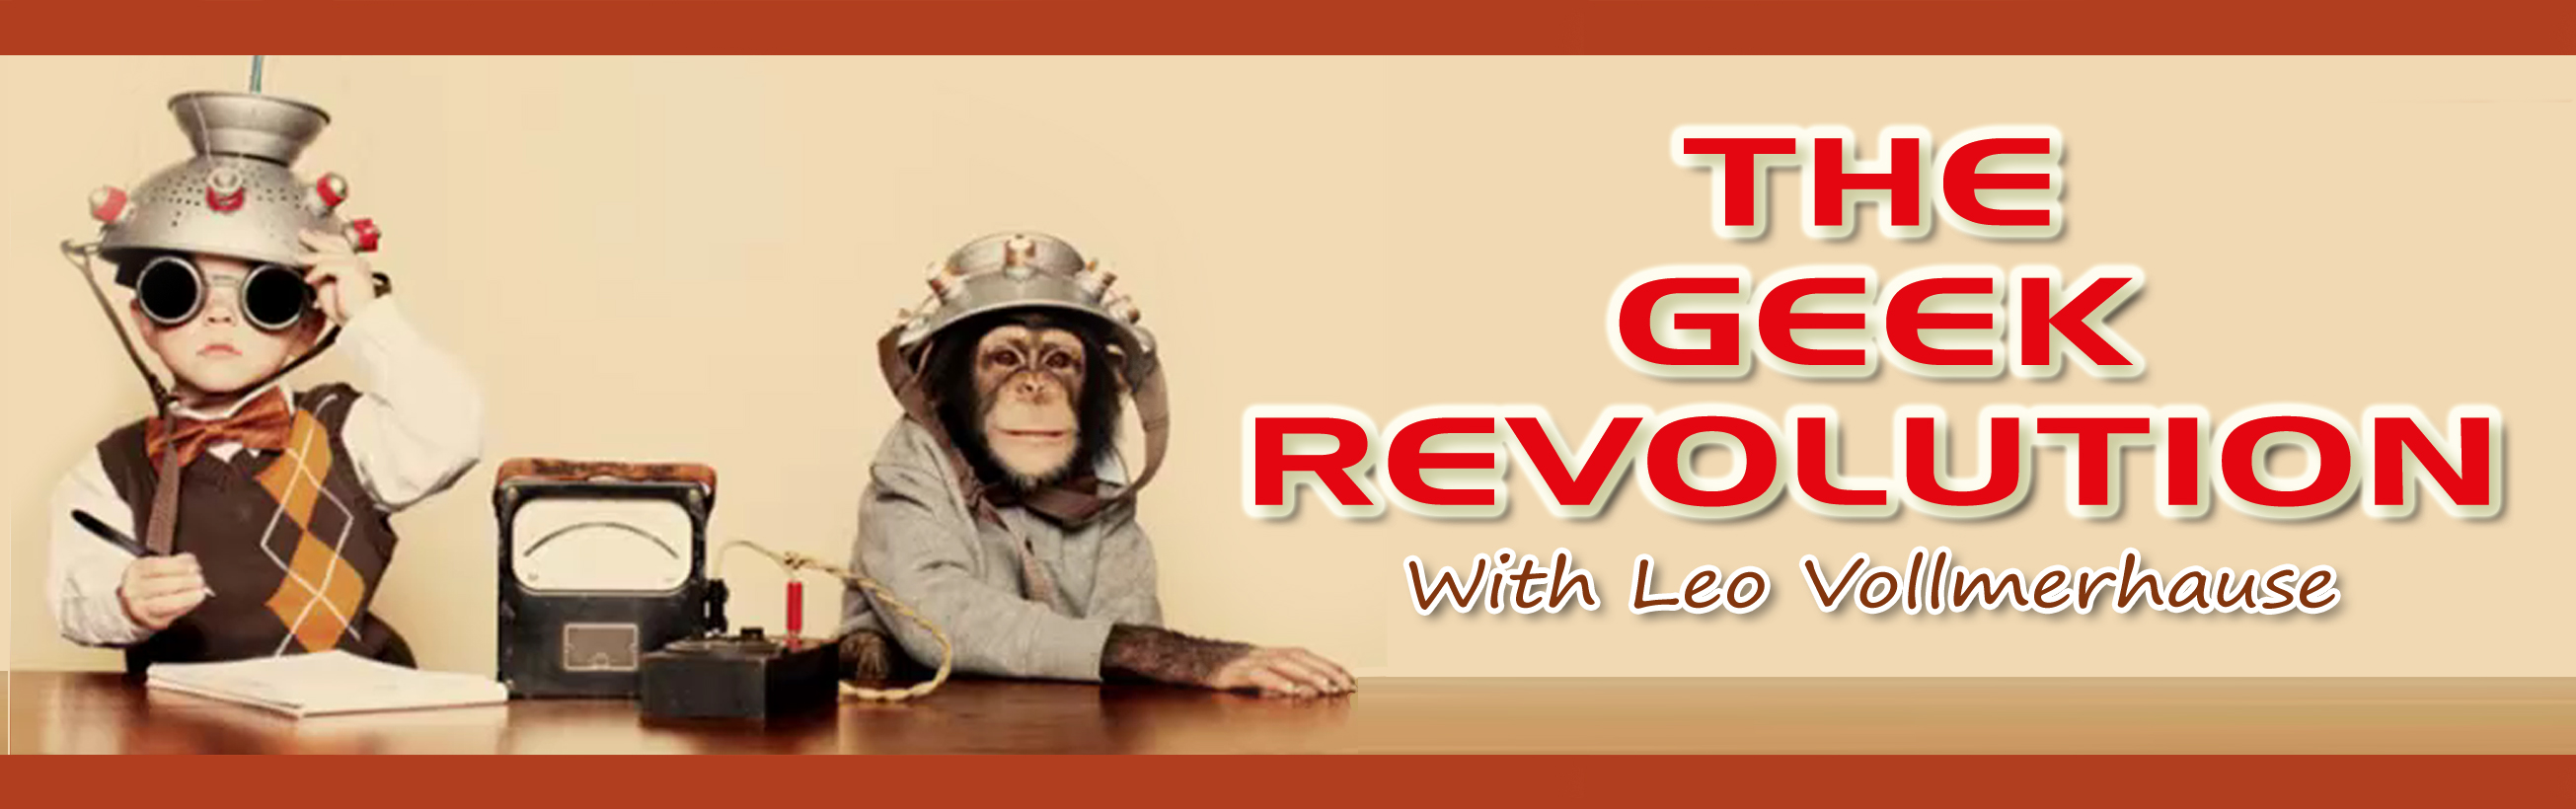 The Geek Revolution Show Home